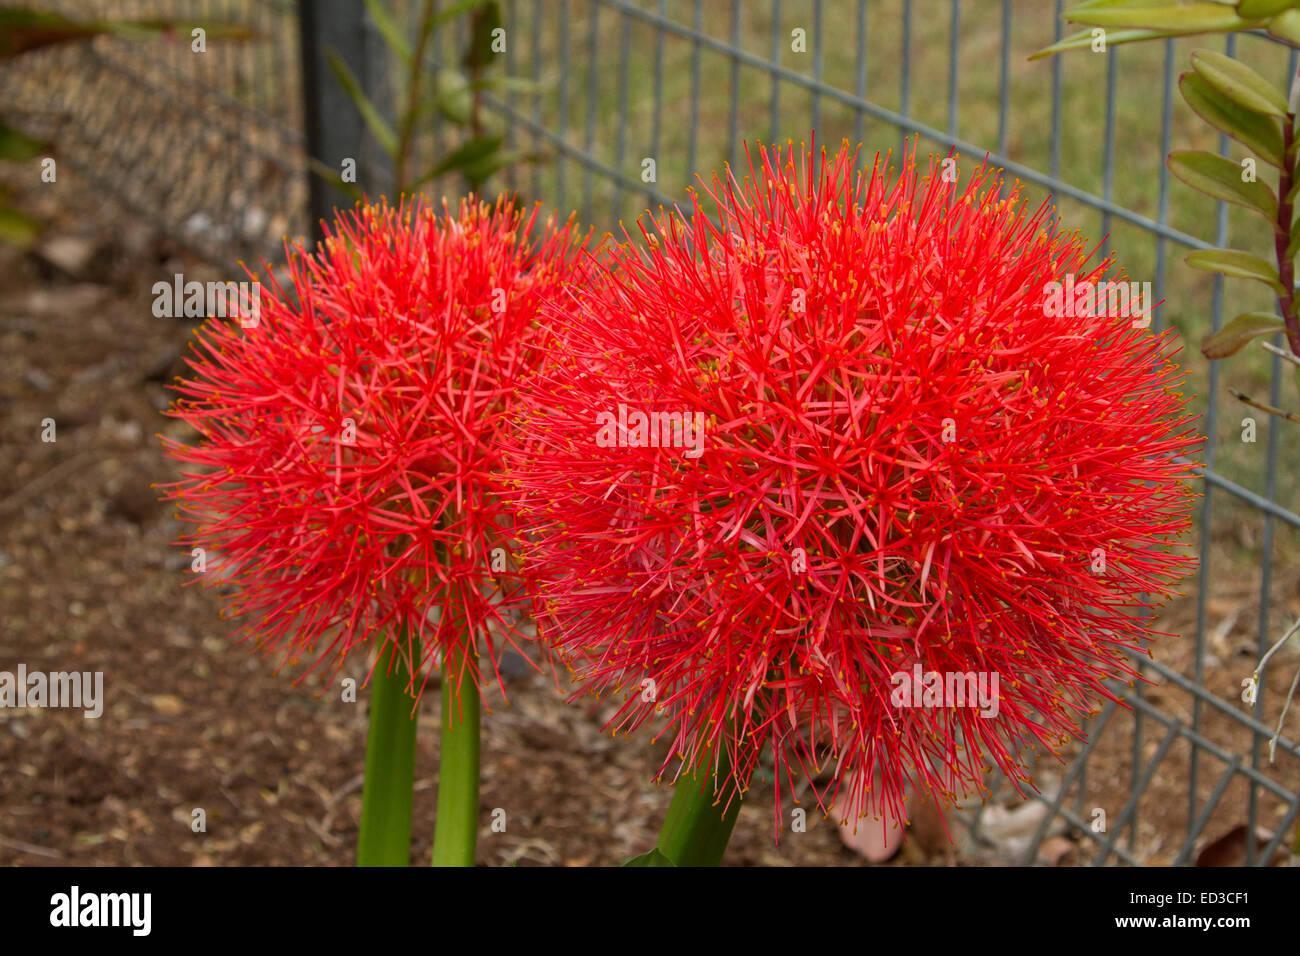 Two large vivid red flowers of African blood lily, Scadoxus multiflorus syn Haemanthus multiflorus - Stock Image